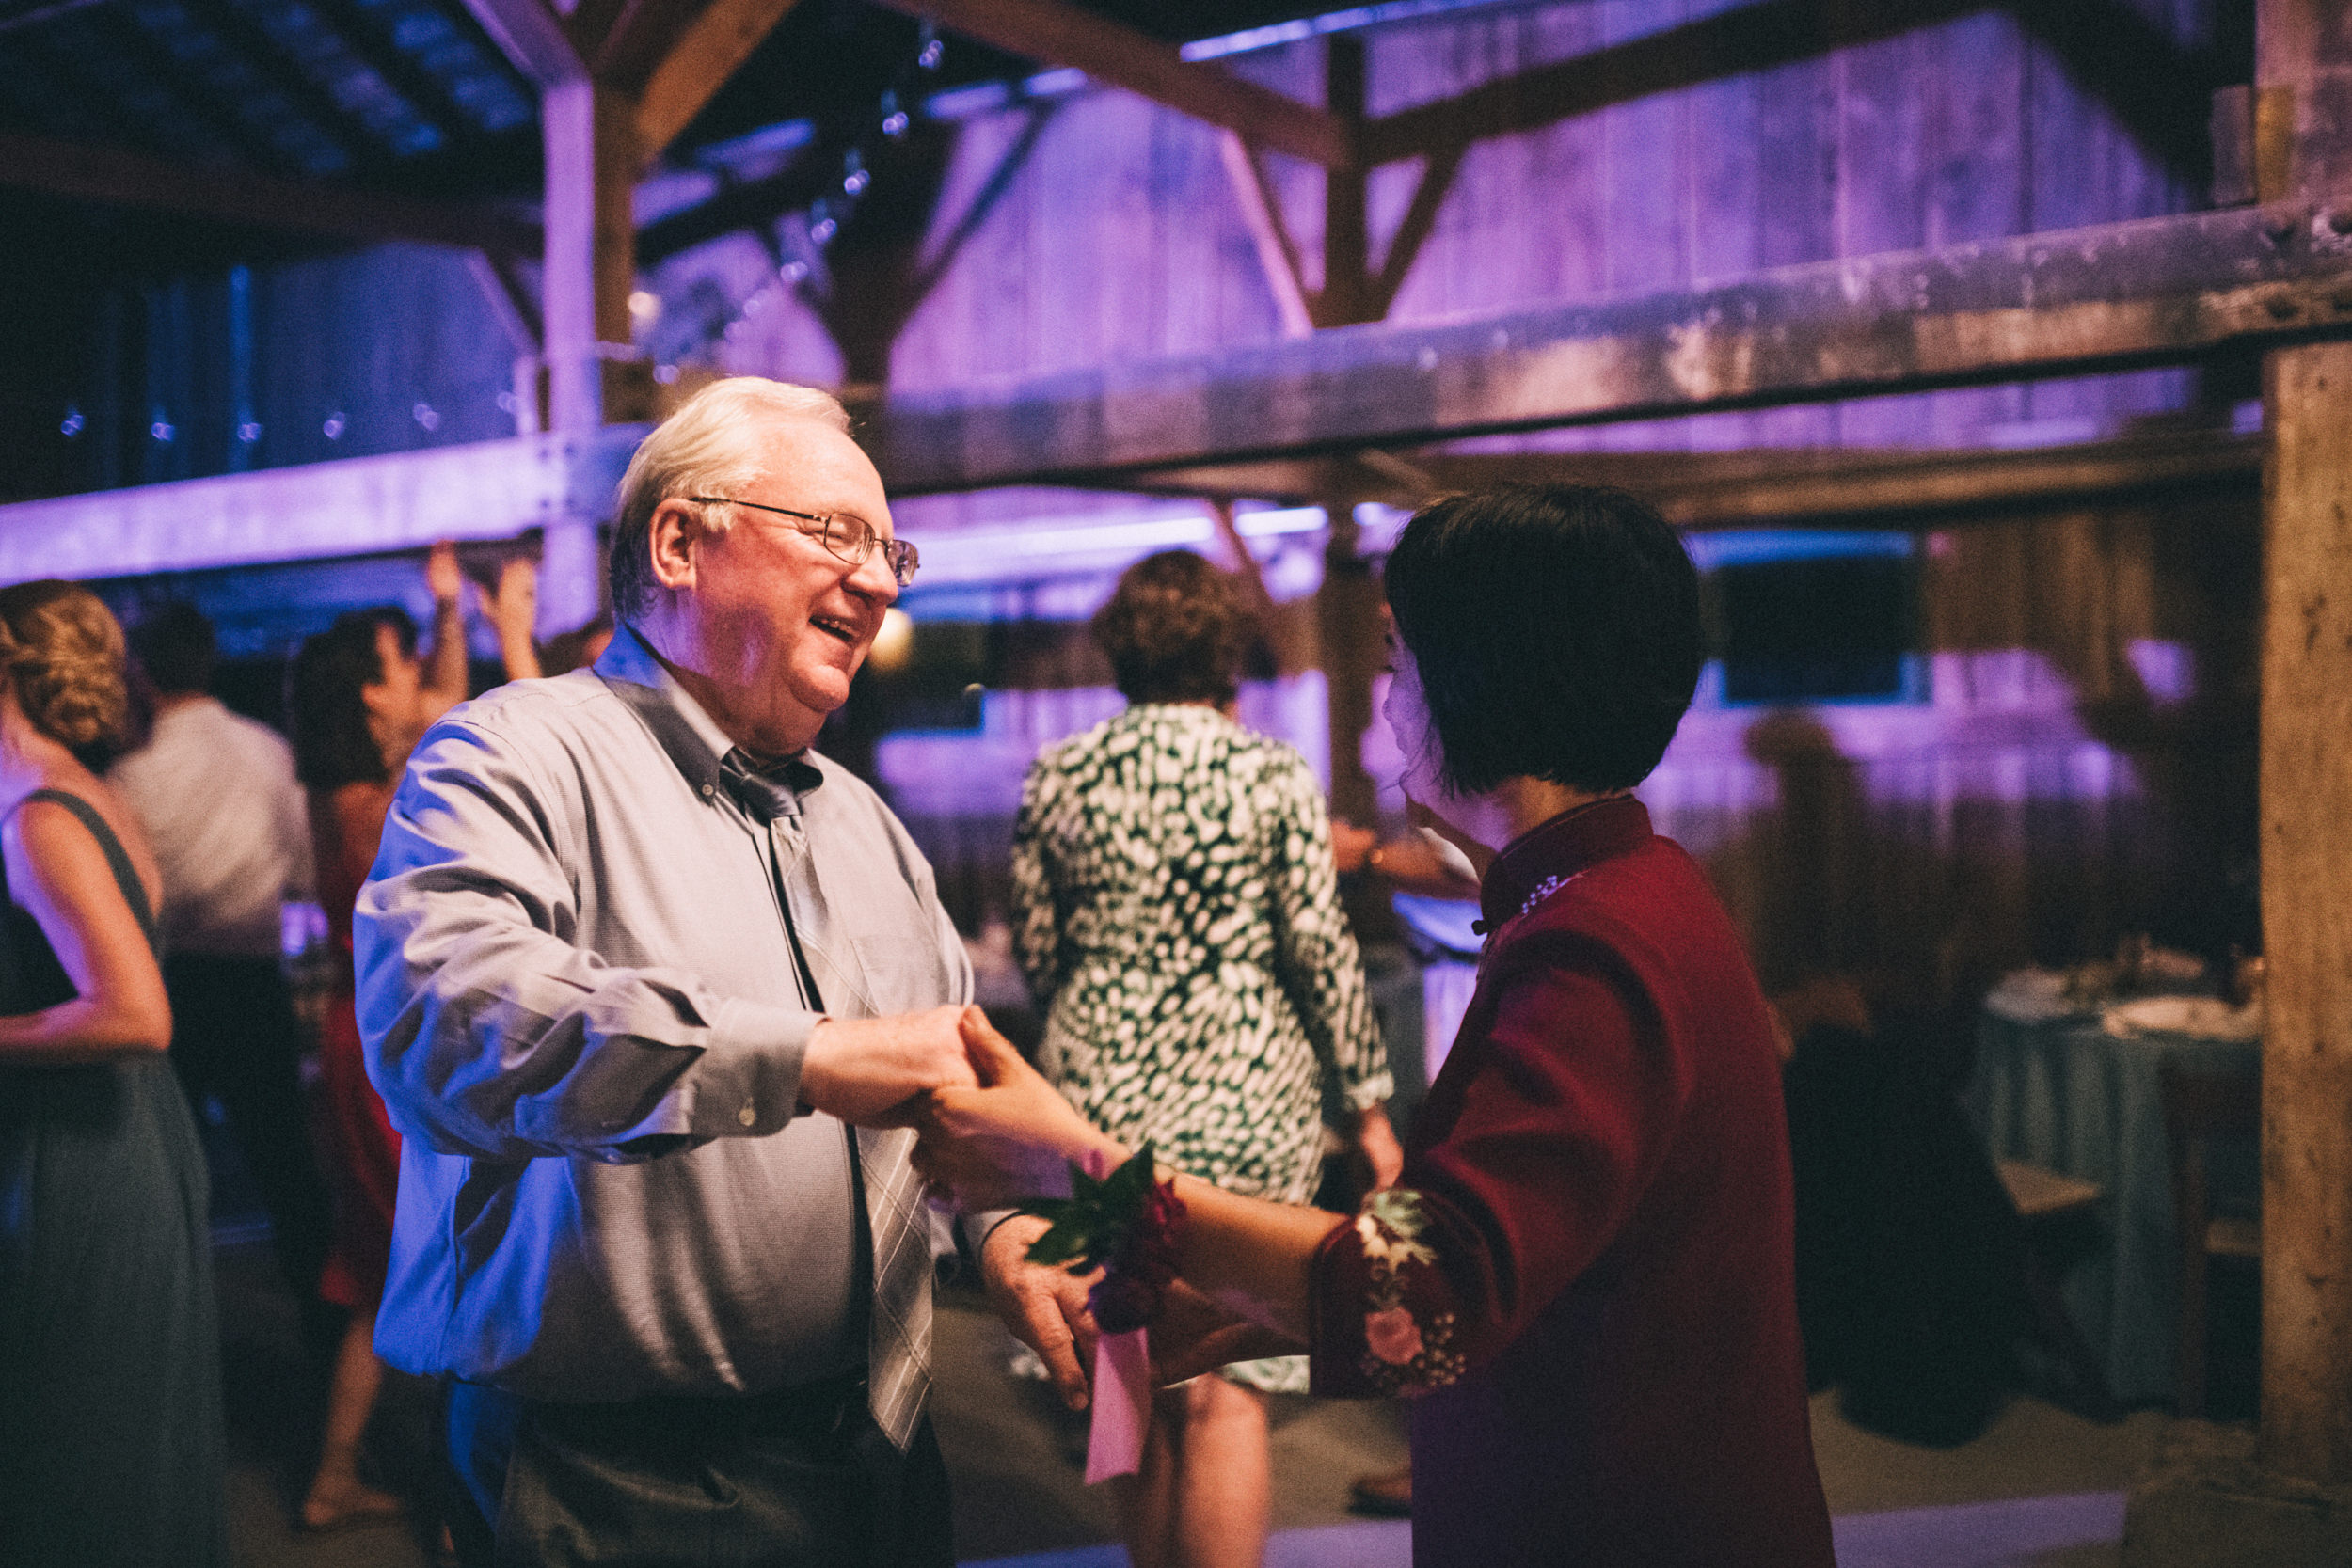 Louisville-Kentucky-Wedding-and-Elopement-Photographer-Sarah-Katherine-Davis-Photography-Summer-Jewel-Toned-Wedding-Chineese-Tea-Ceremony-Warrenwood-Manor-Danville-1030.jpg